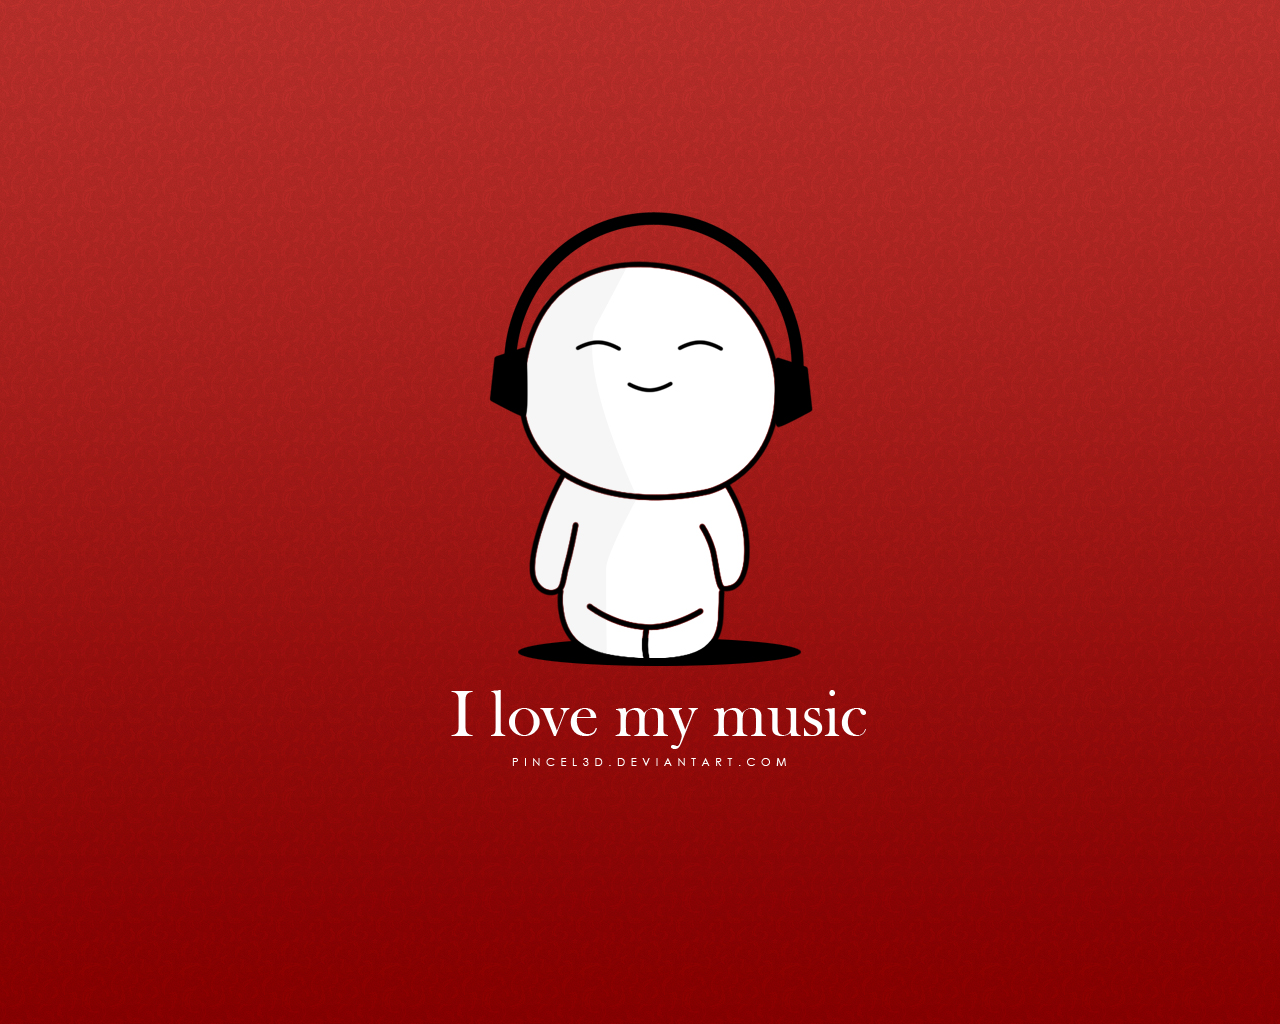 Music Wallpaper: I Love Music Wallpapers